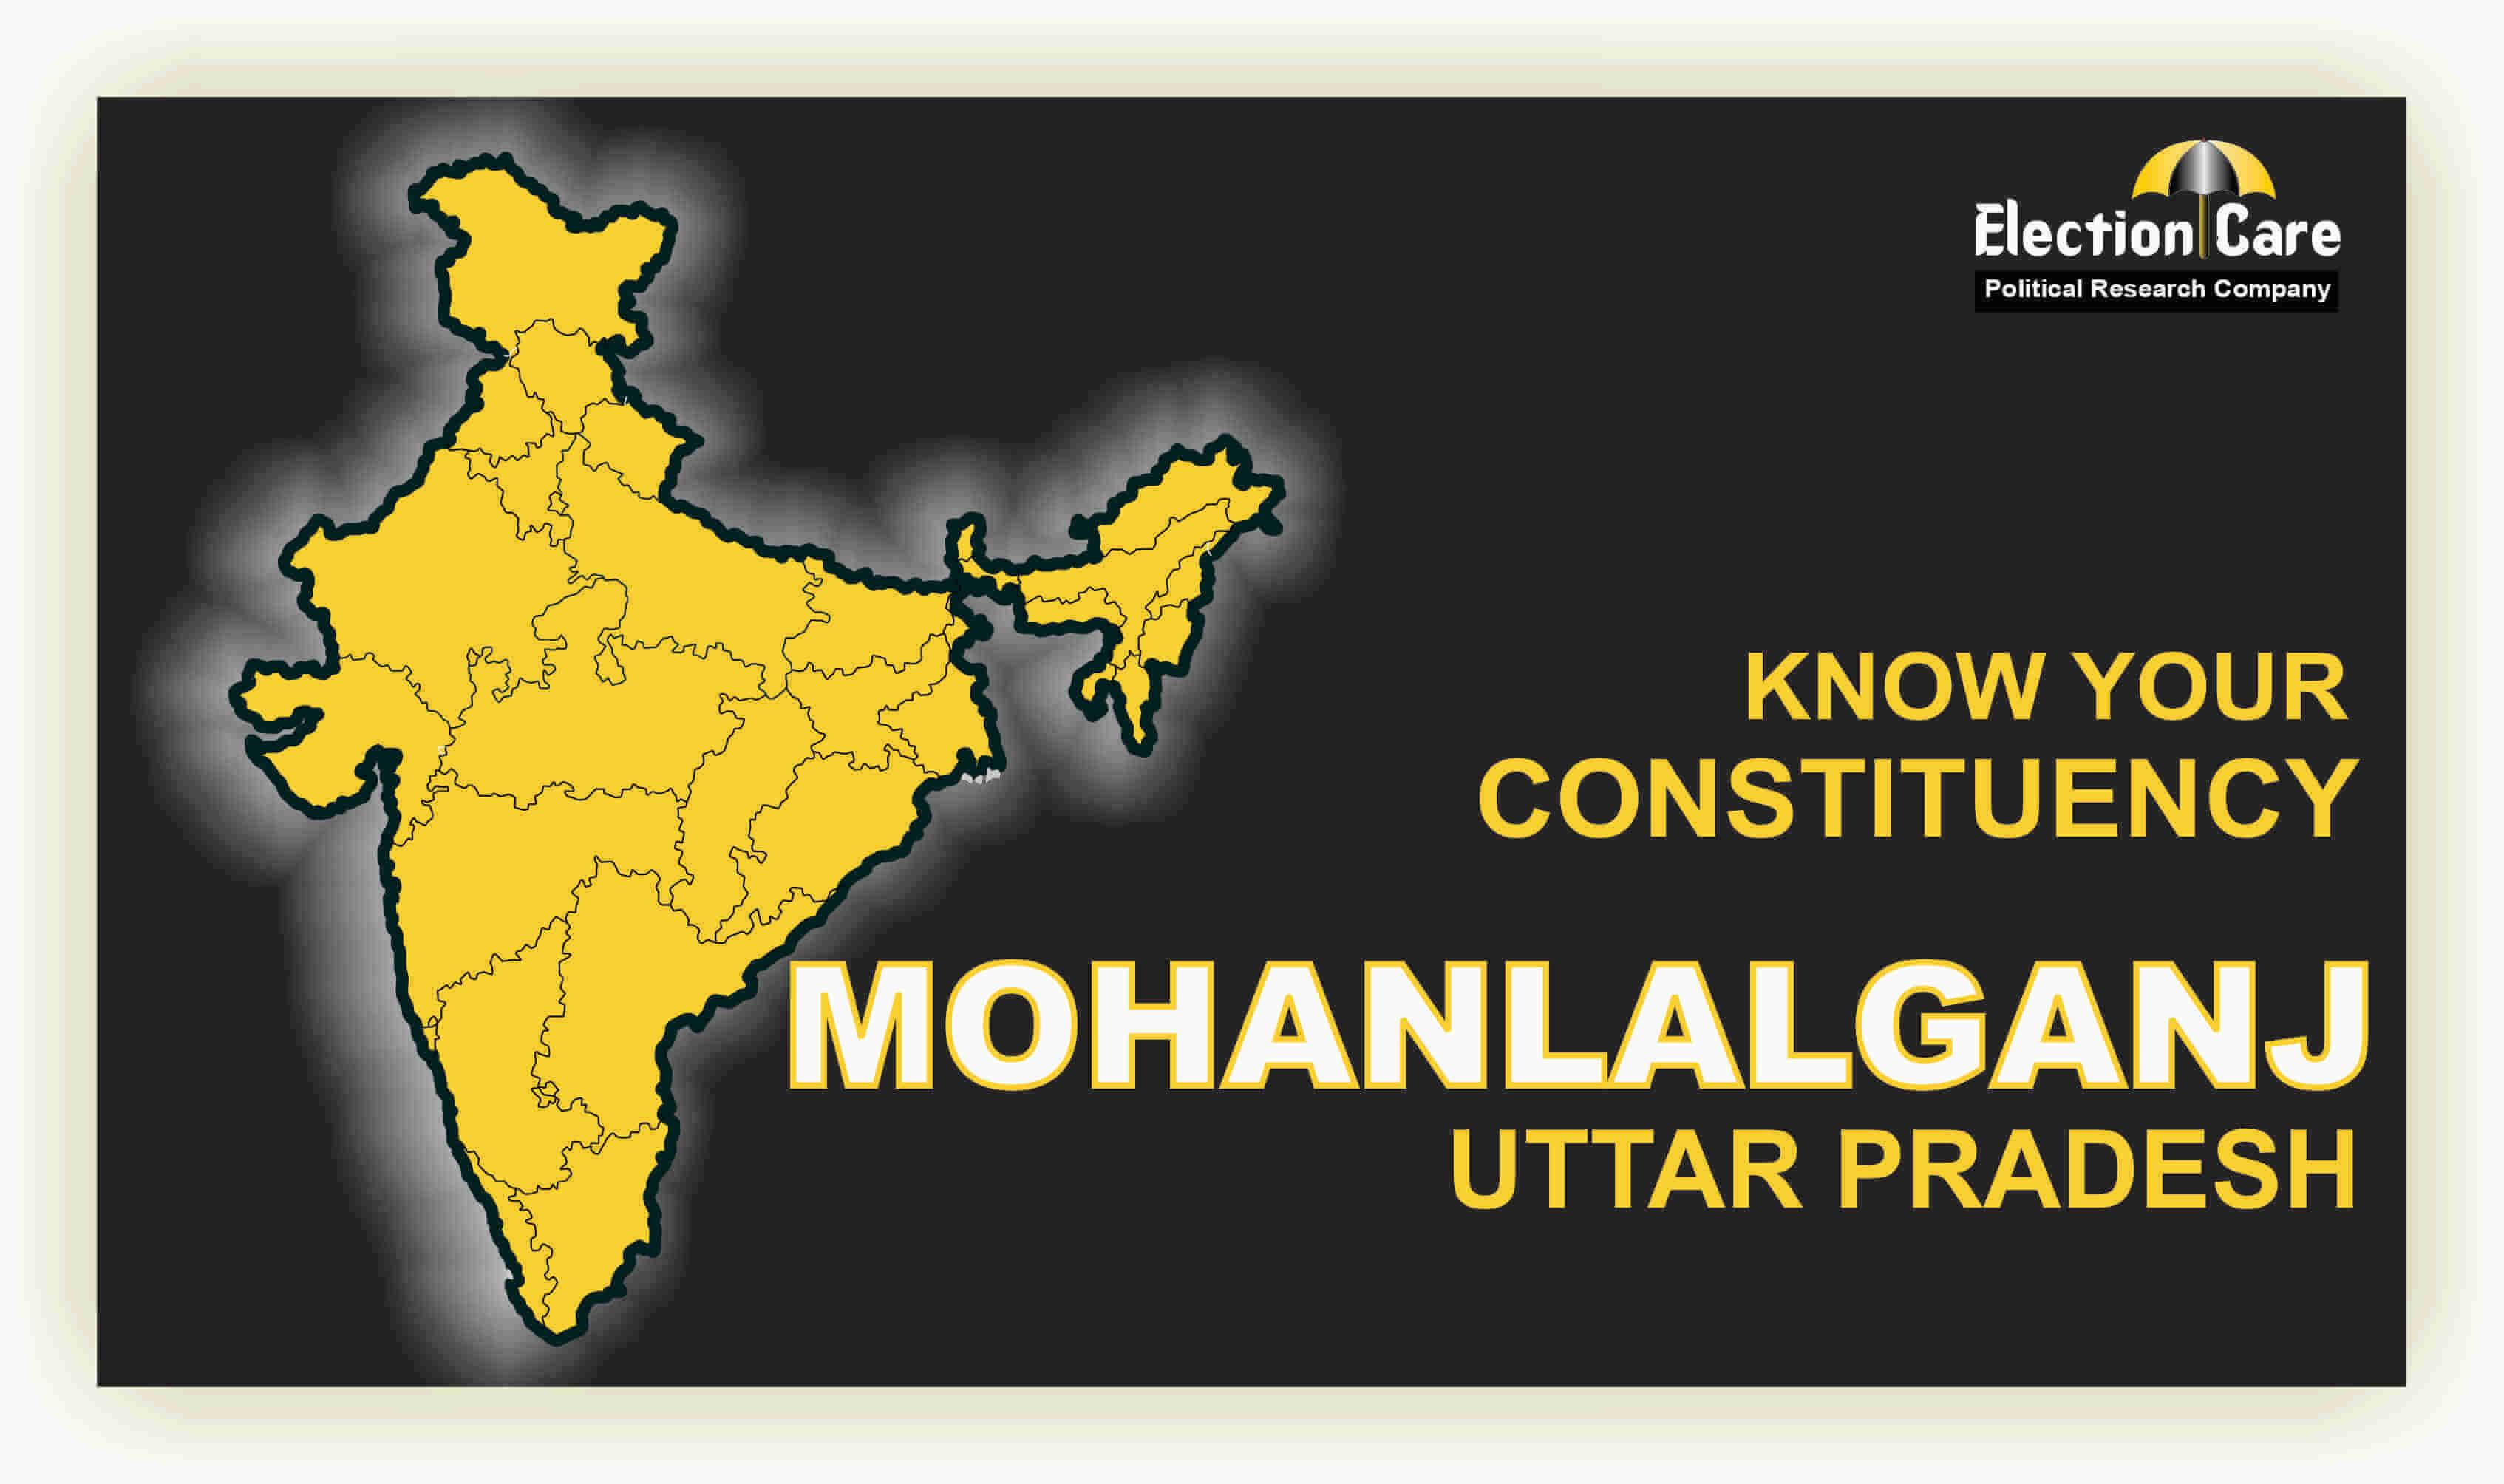 Mohanlalganj Parliament Election Result